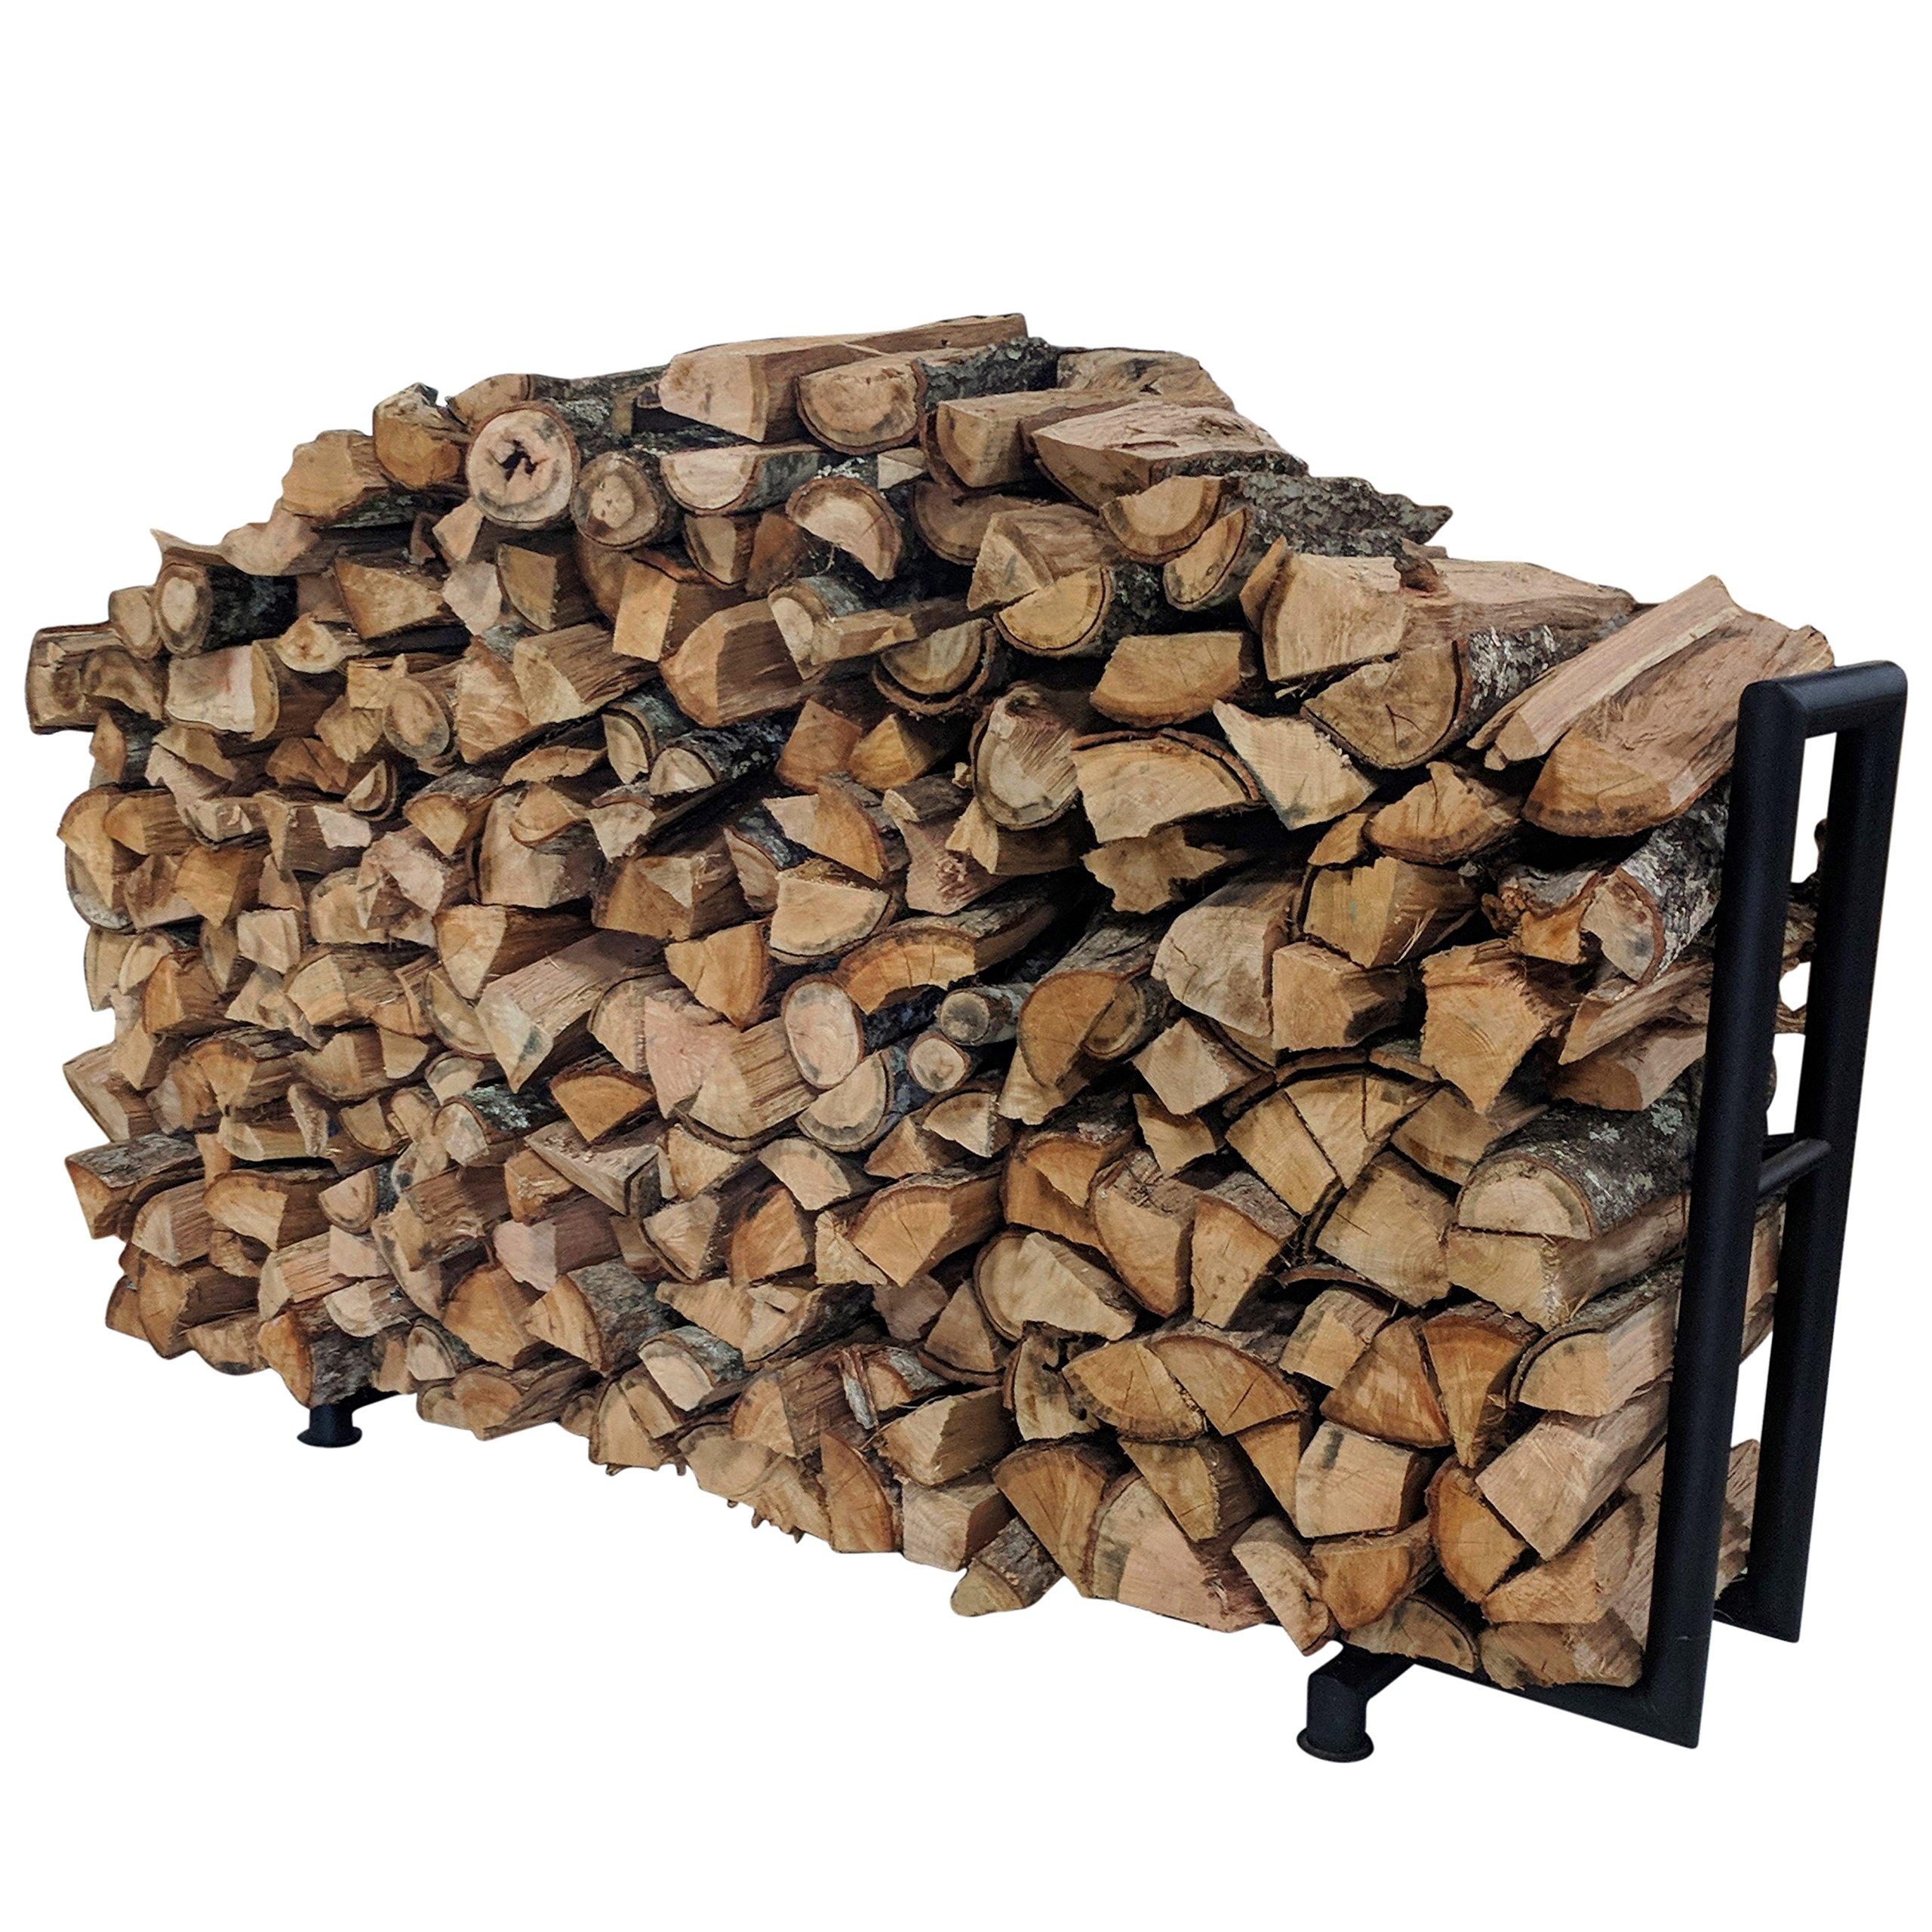 Titan Outdoors Rectangular Heavy Duty Outdoor Log Rack | 6 Feet, Black